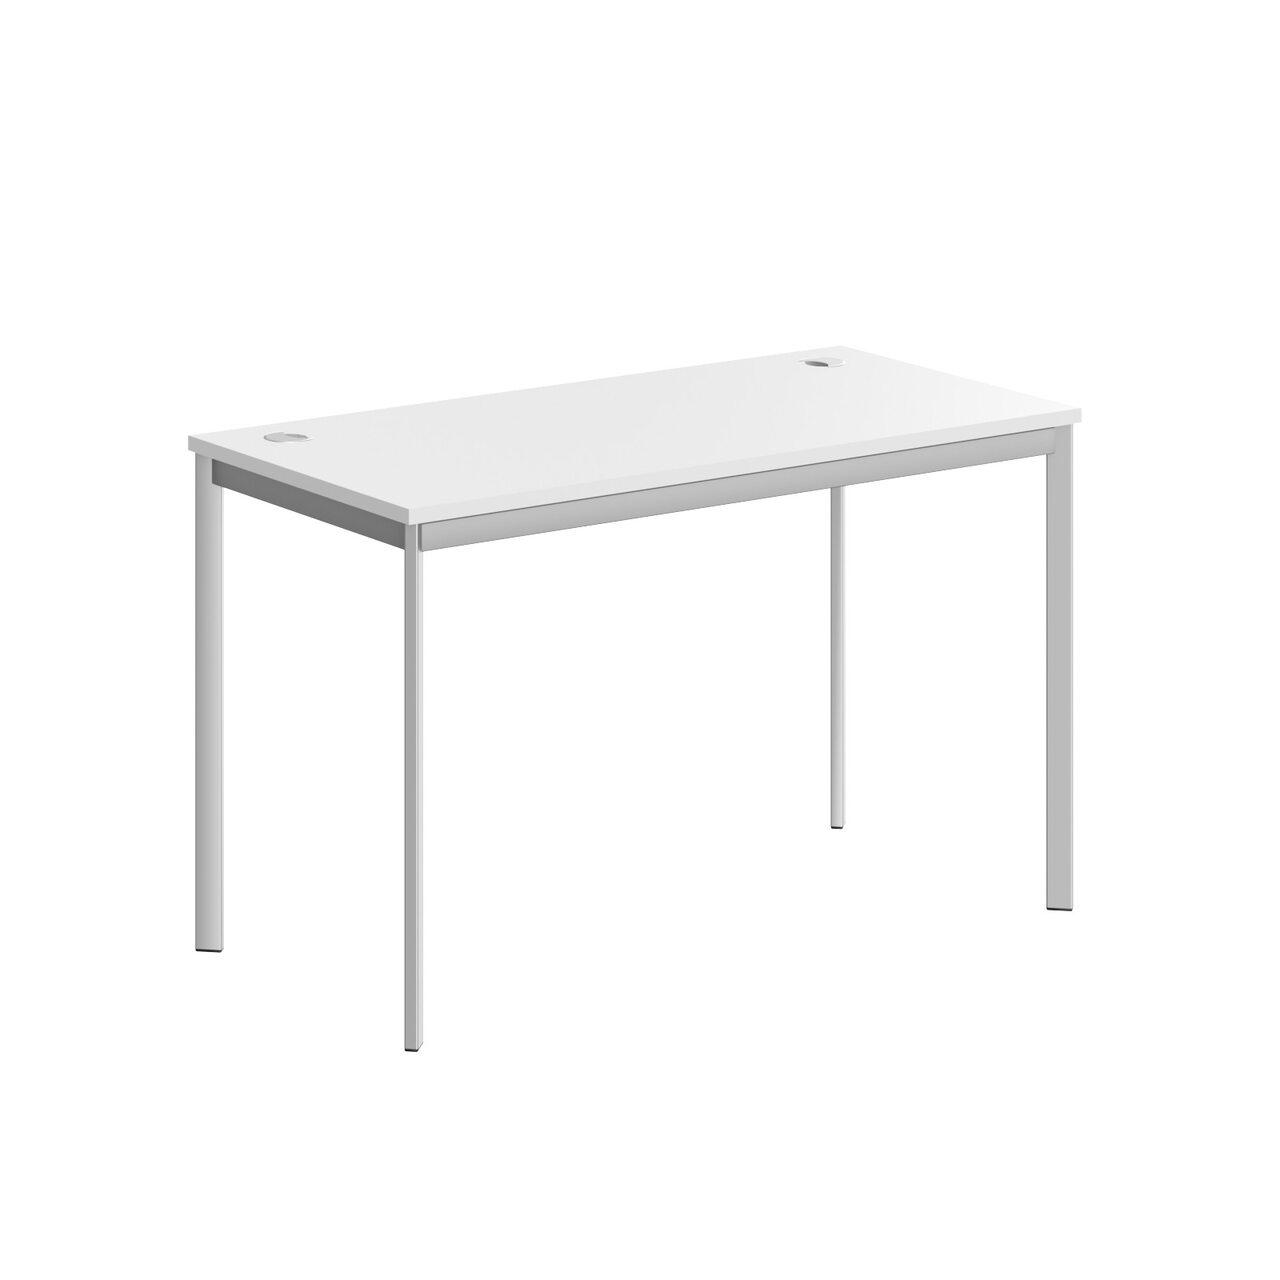 Стол прямой  IMAGO-S 120x60x76 - фото 2